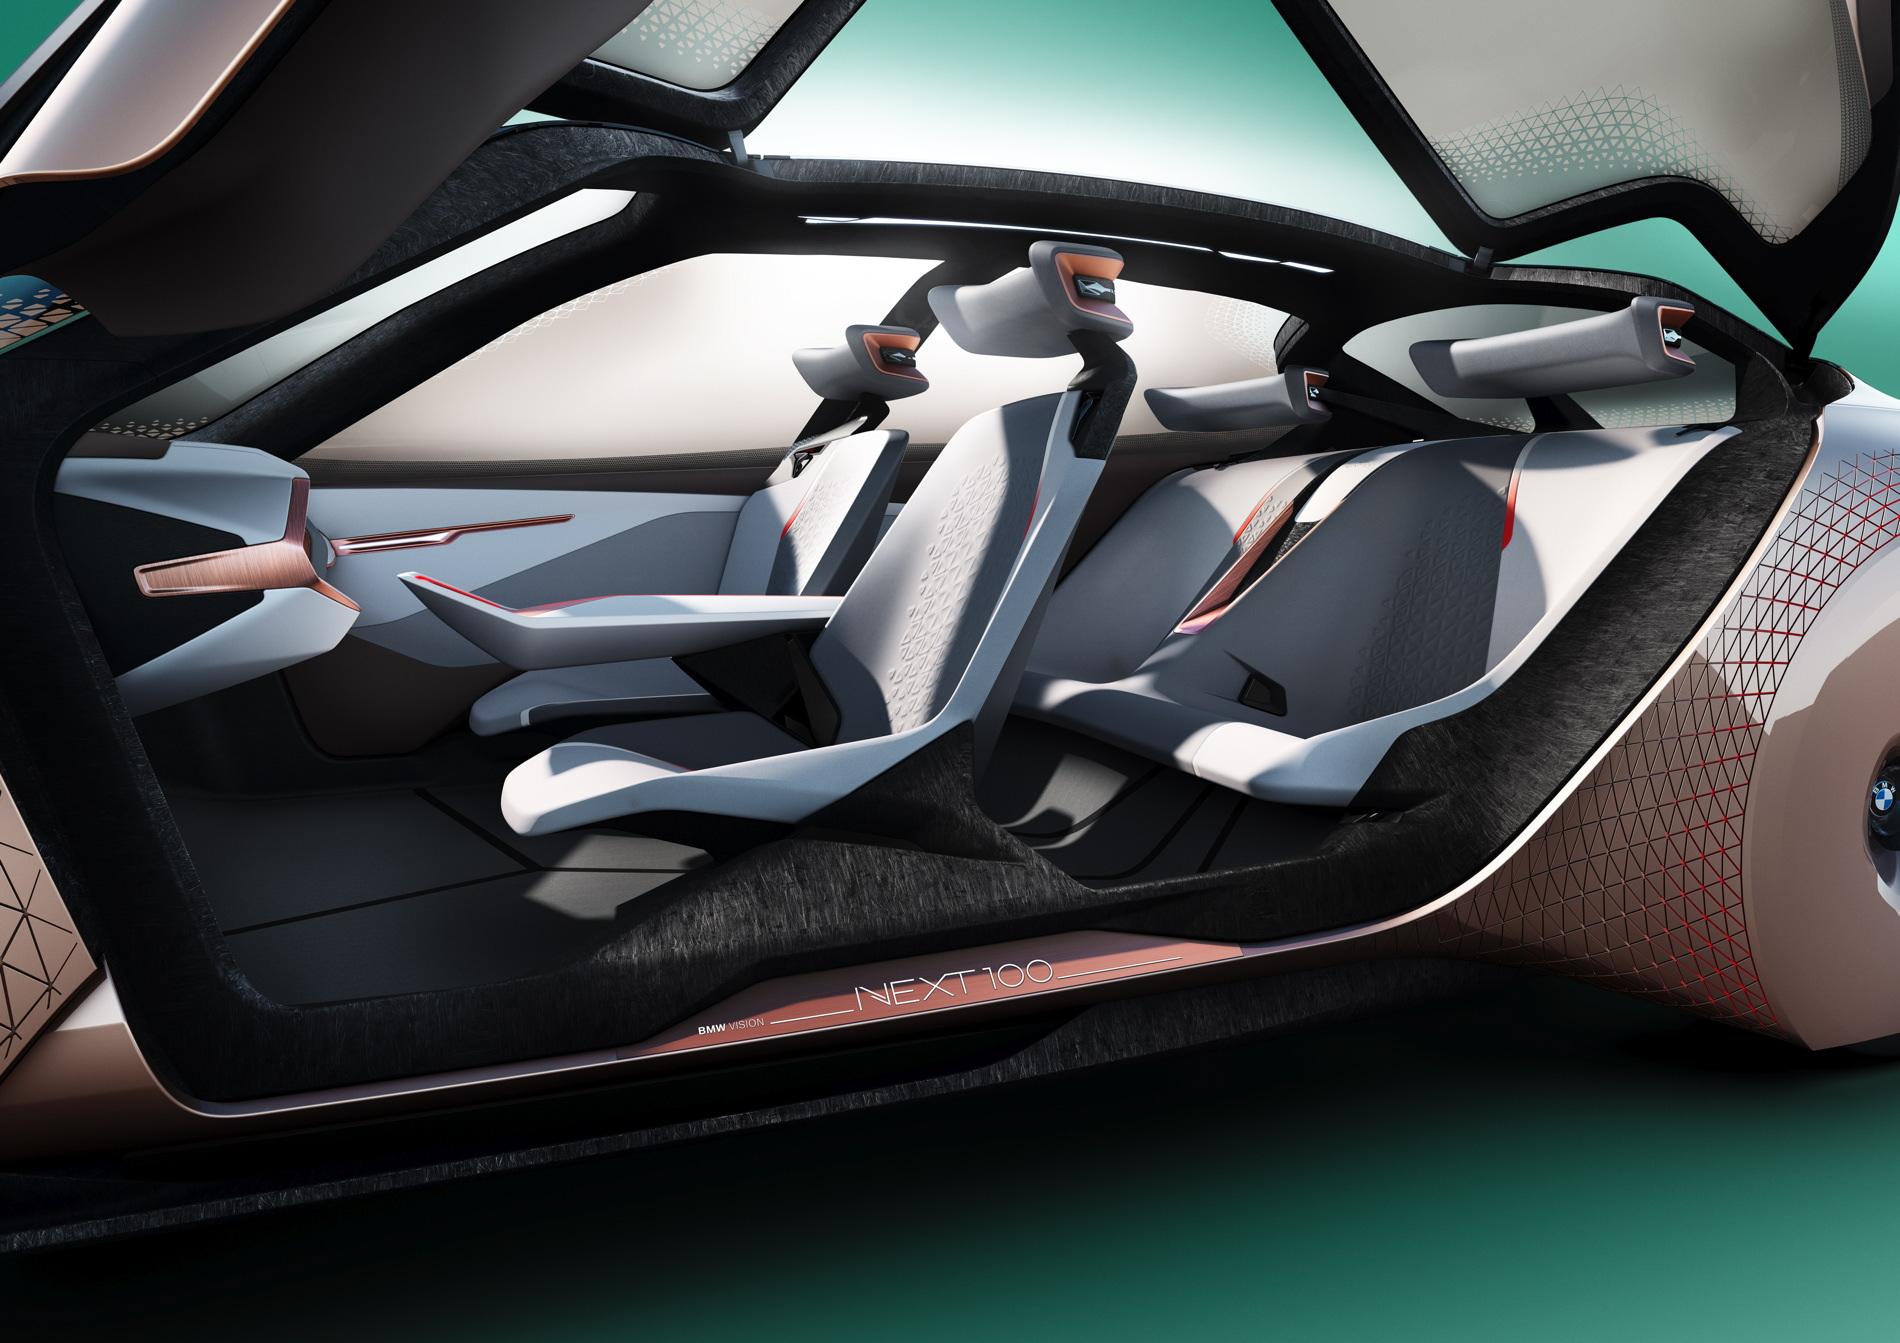 BMW-VISION-NEXT-100-64